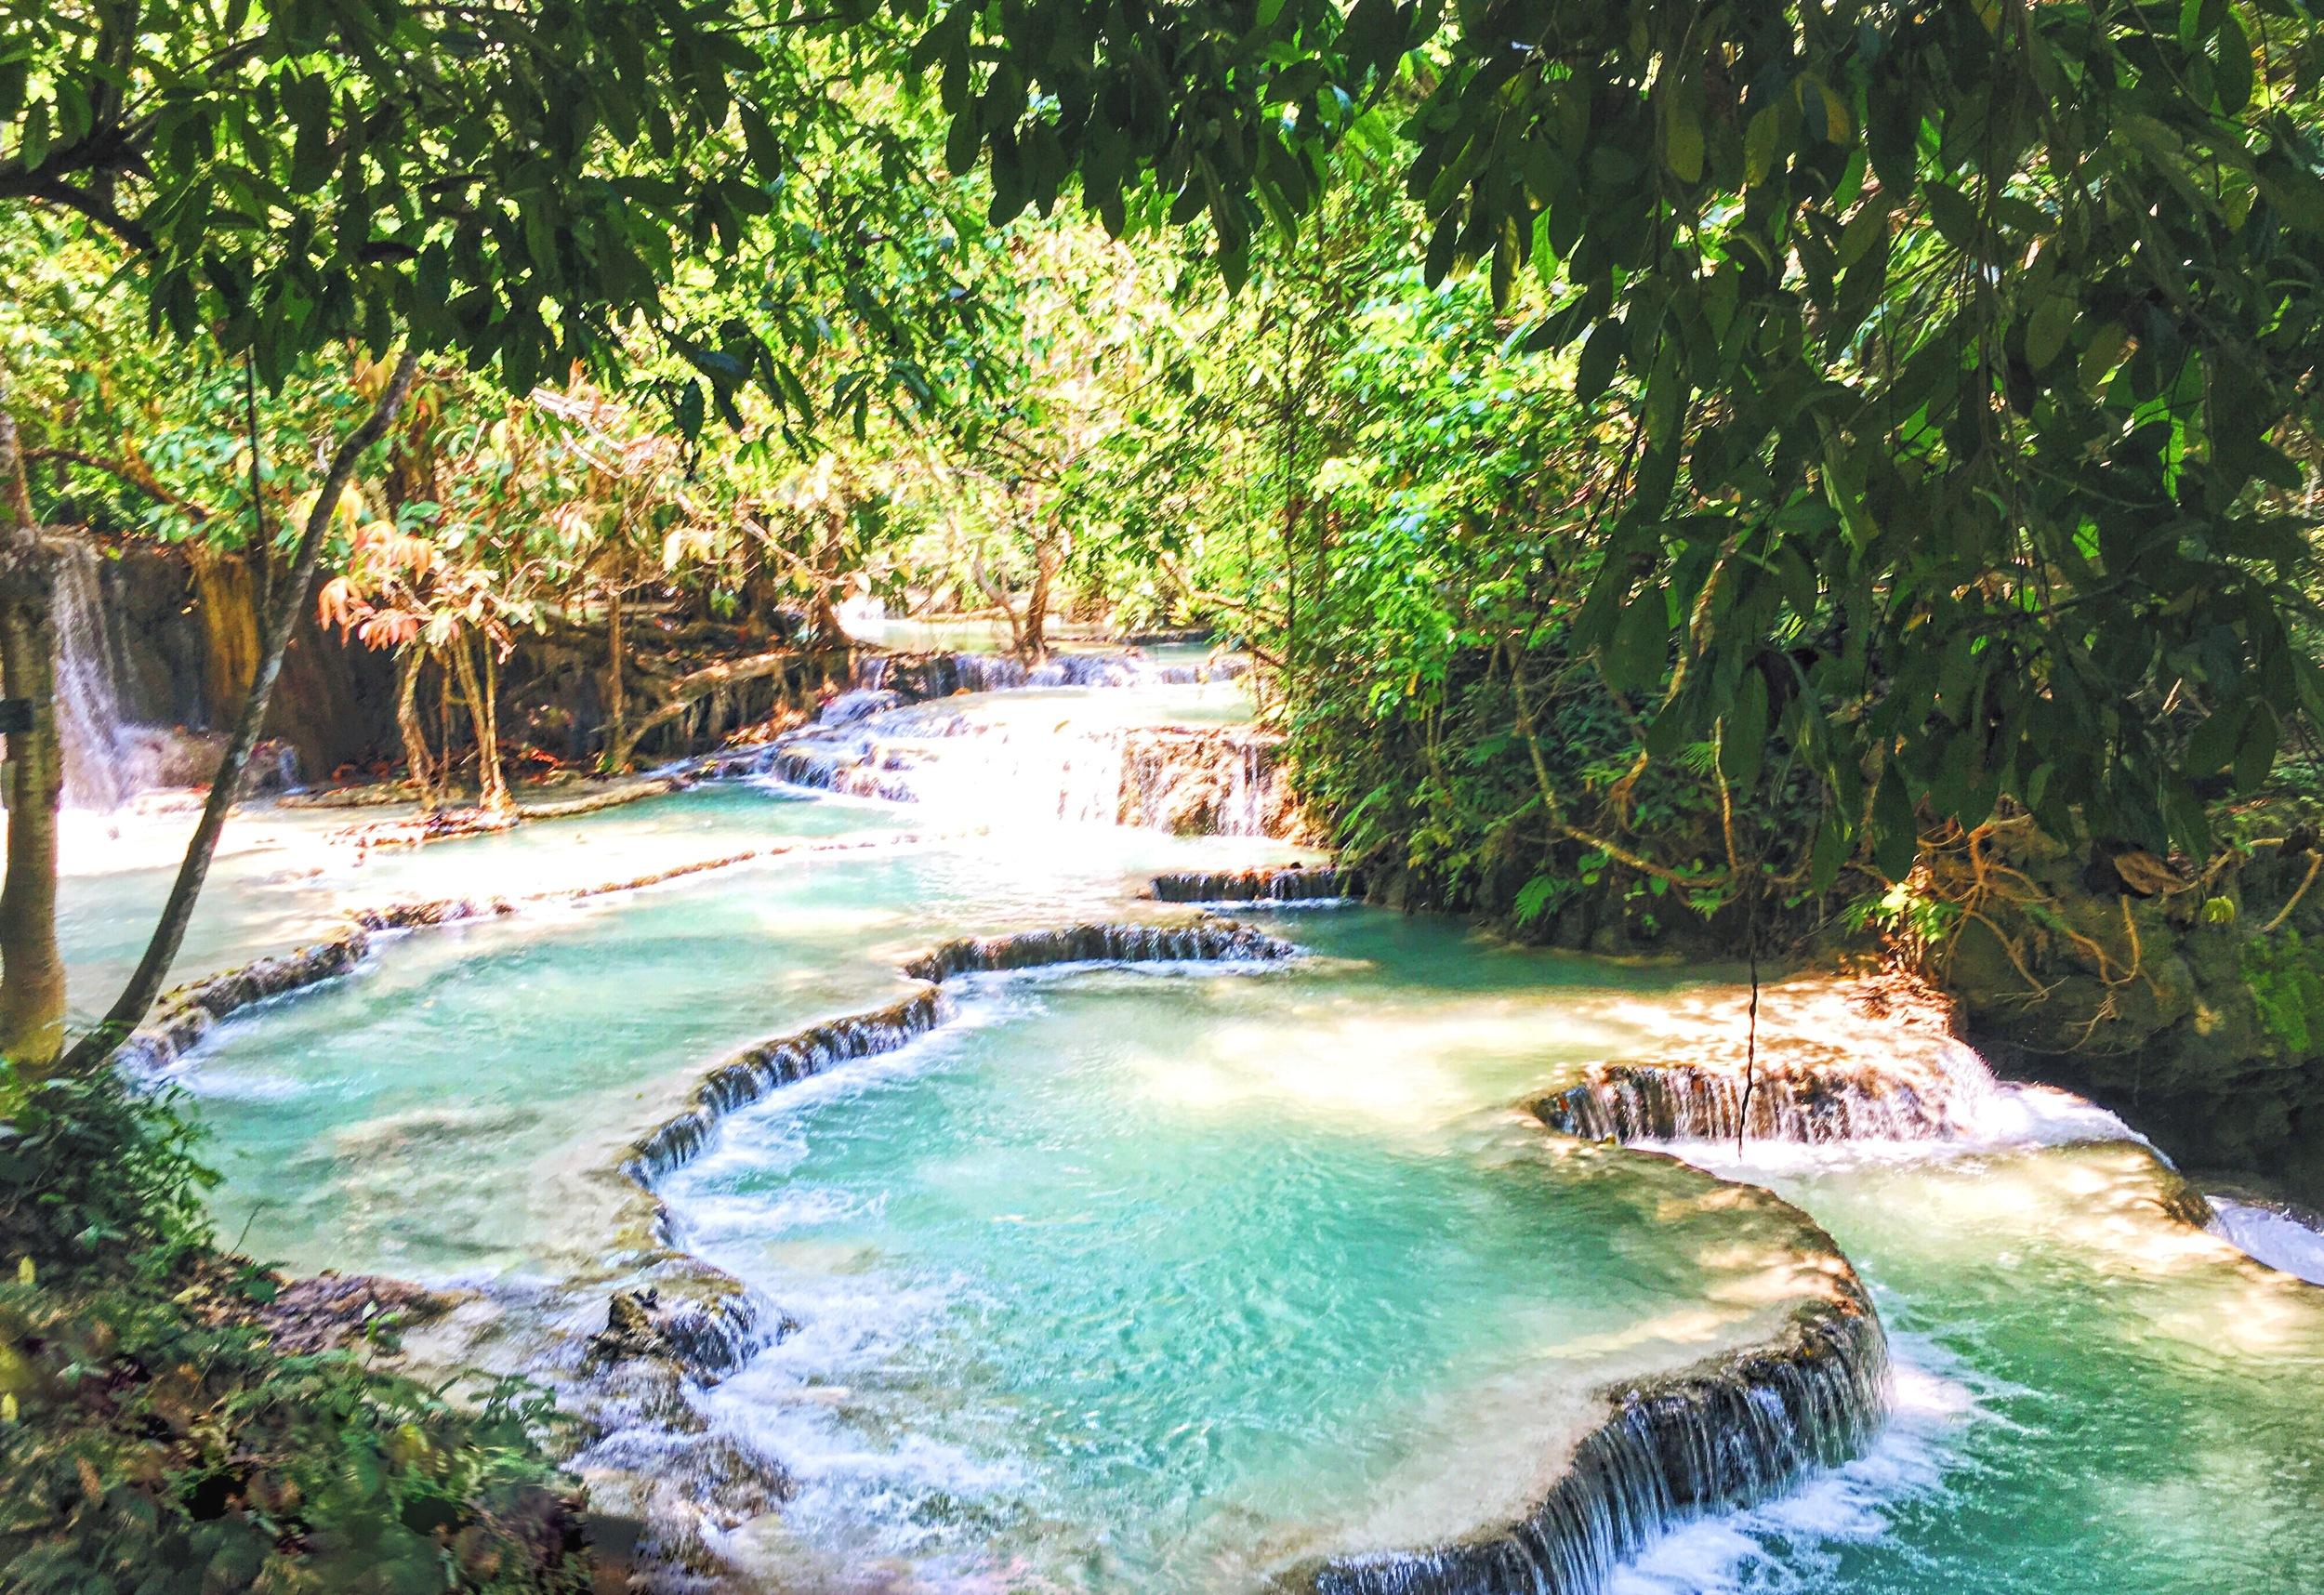 Kuang Si Falls in Luang Prabang, Laos - illumelation